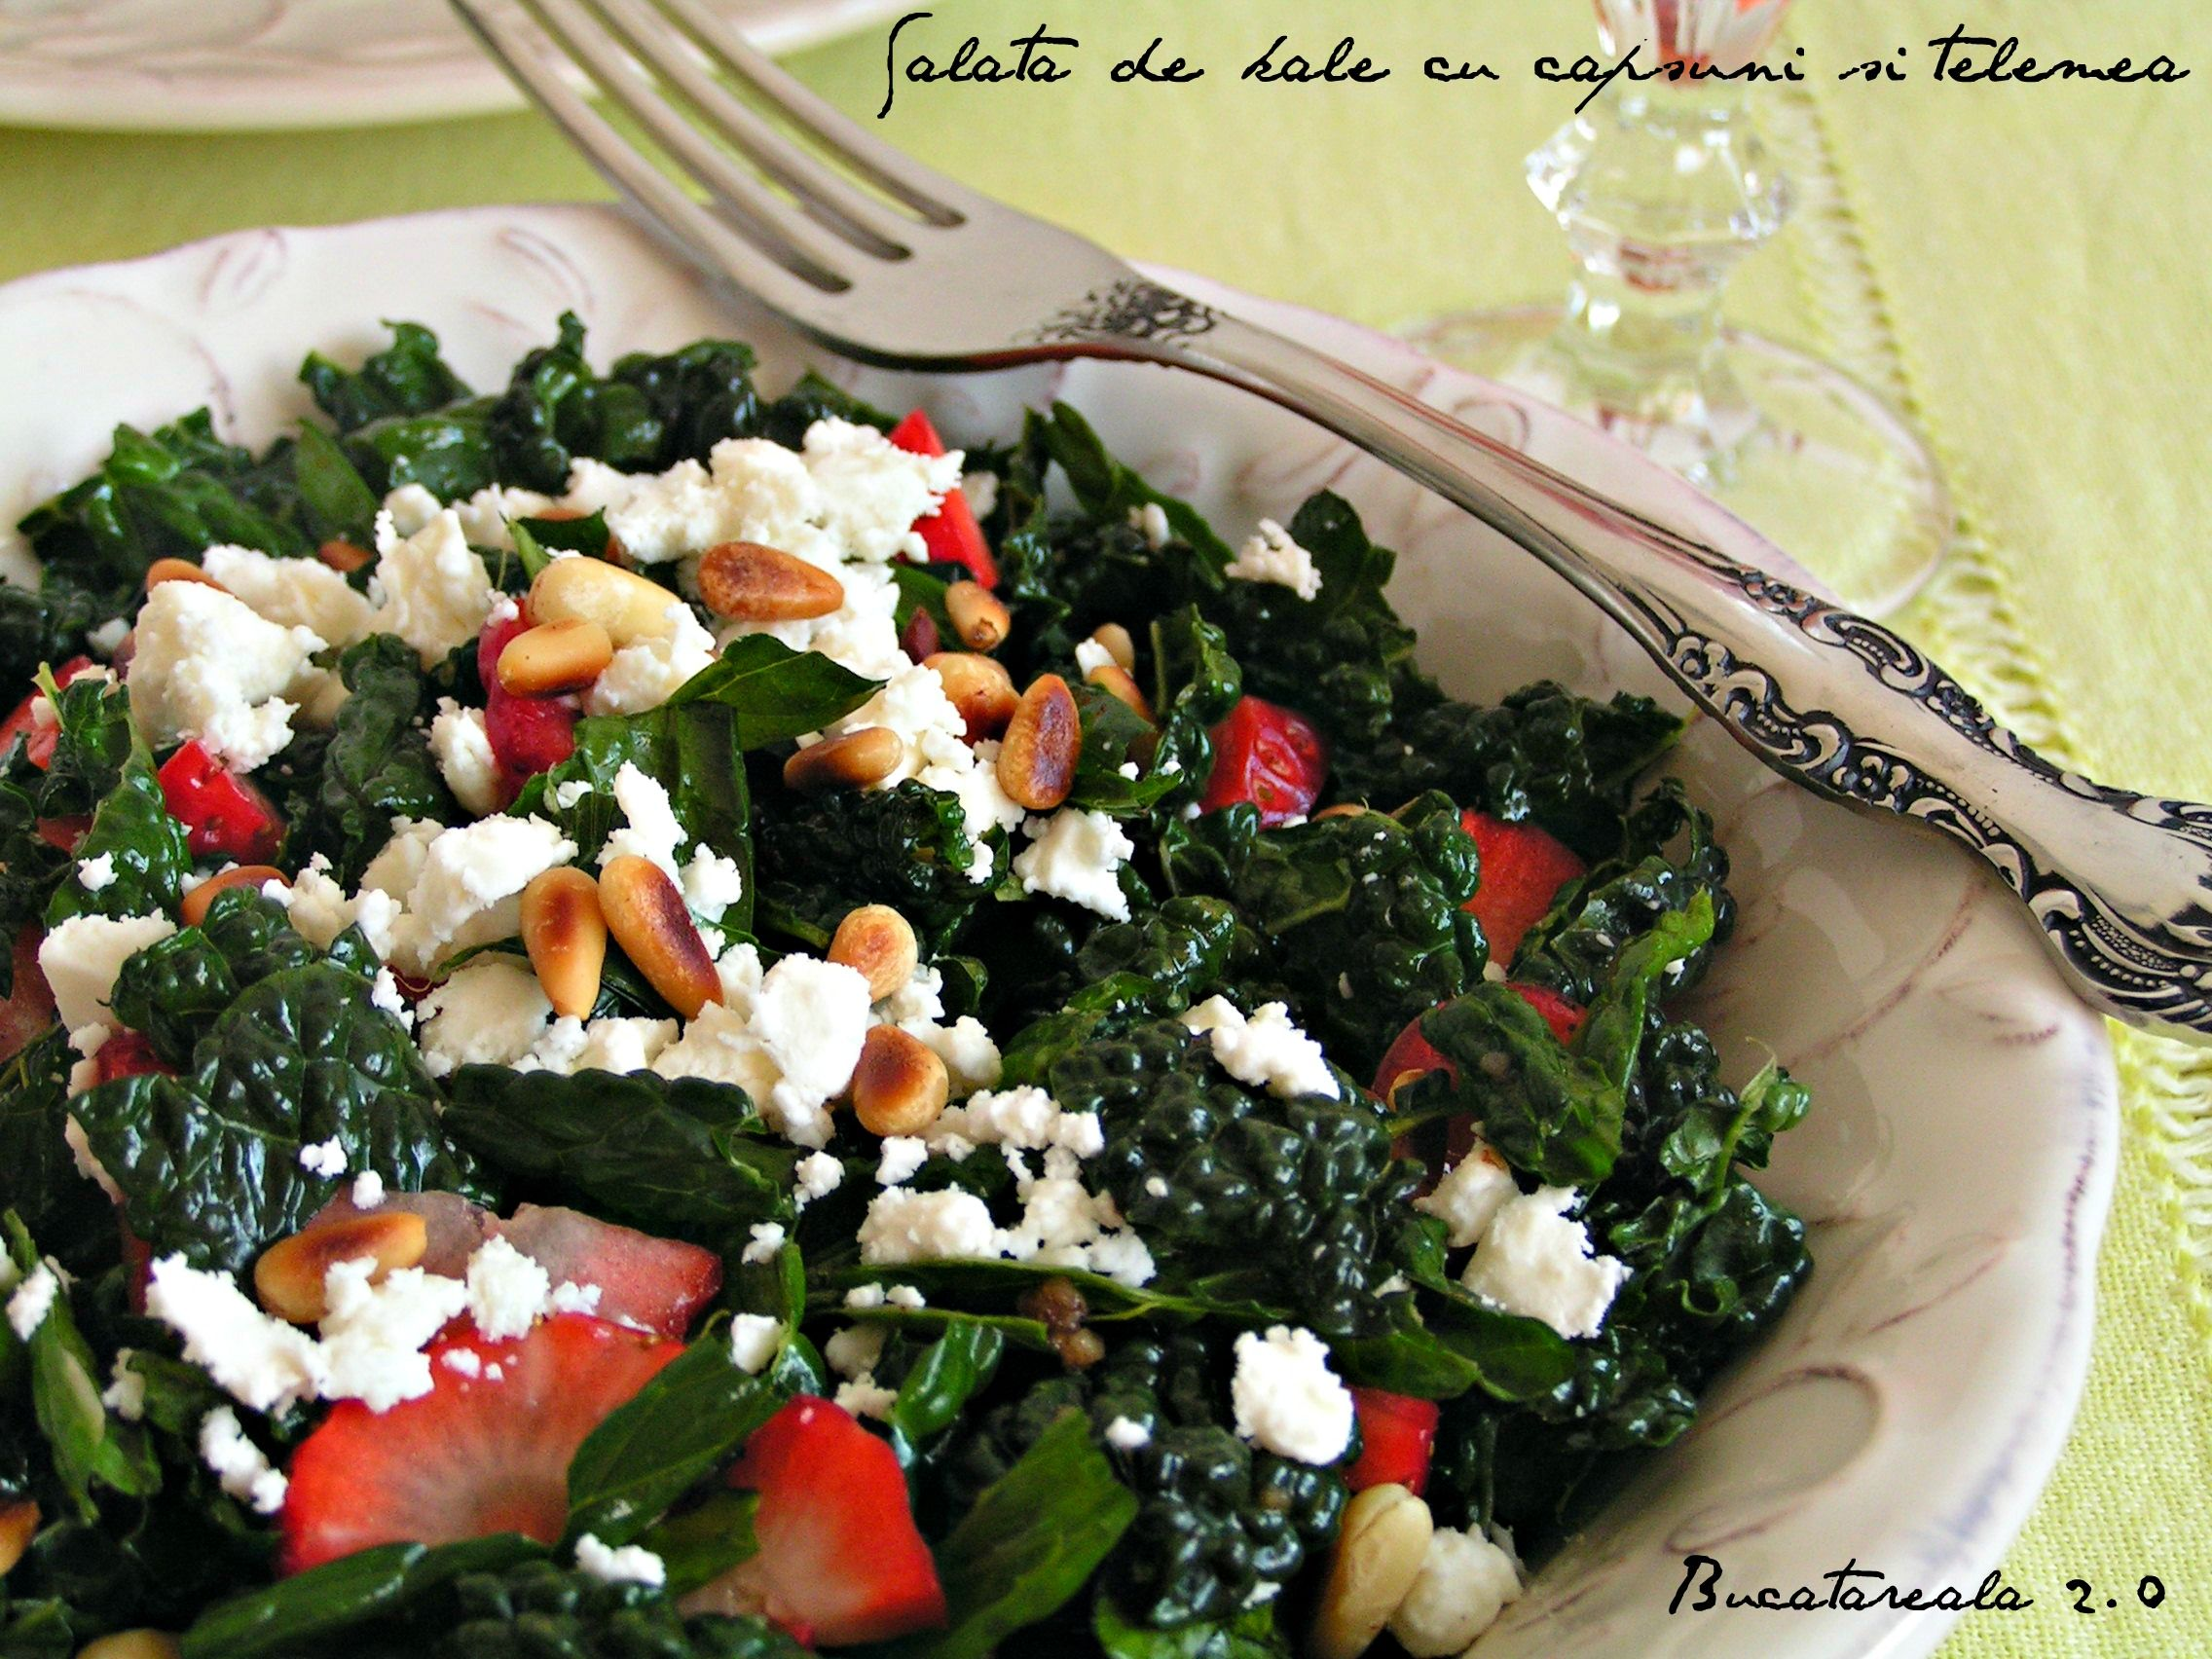 http://bucatarealaindoi.blogspot.ro/2014/02/salata-de-kale-cu-capsuni-si-telemea.html